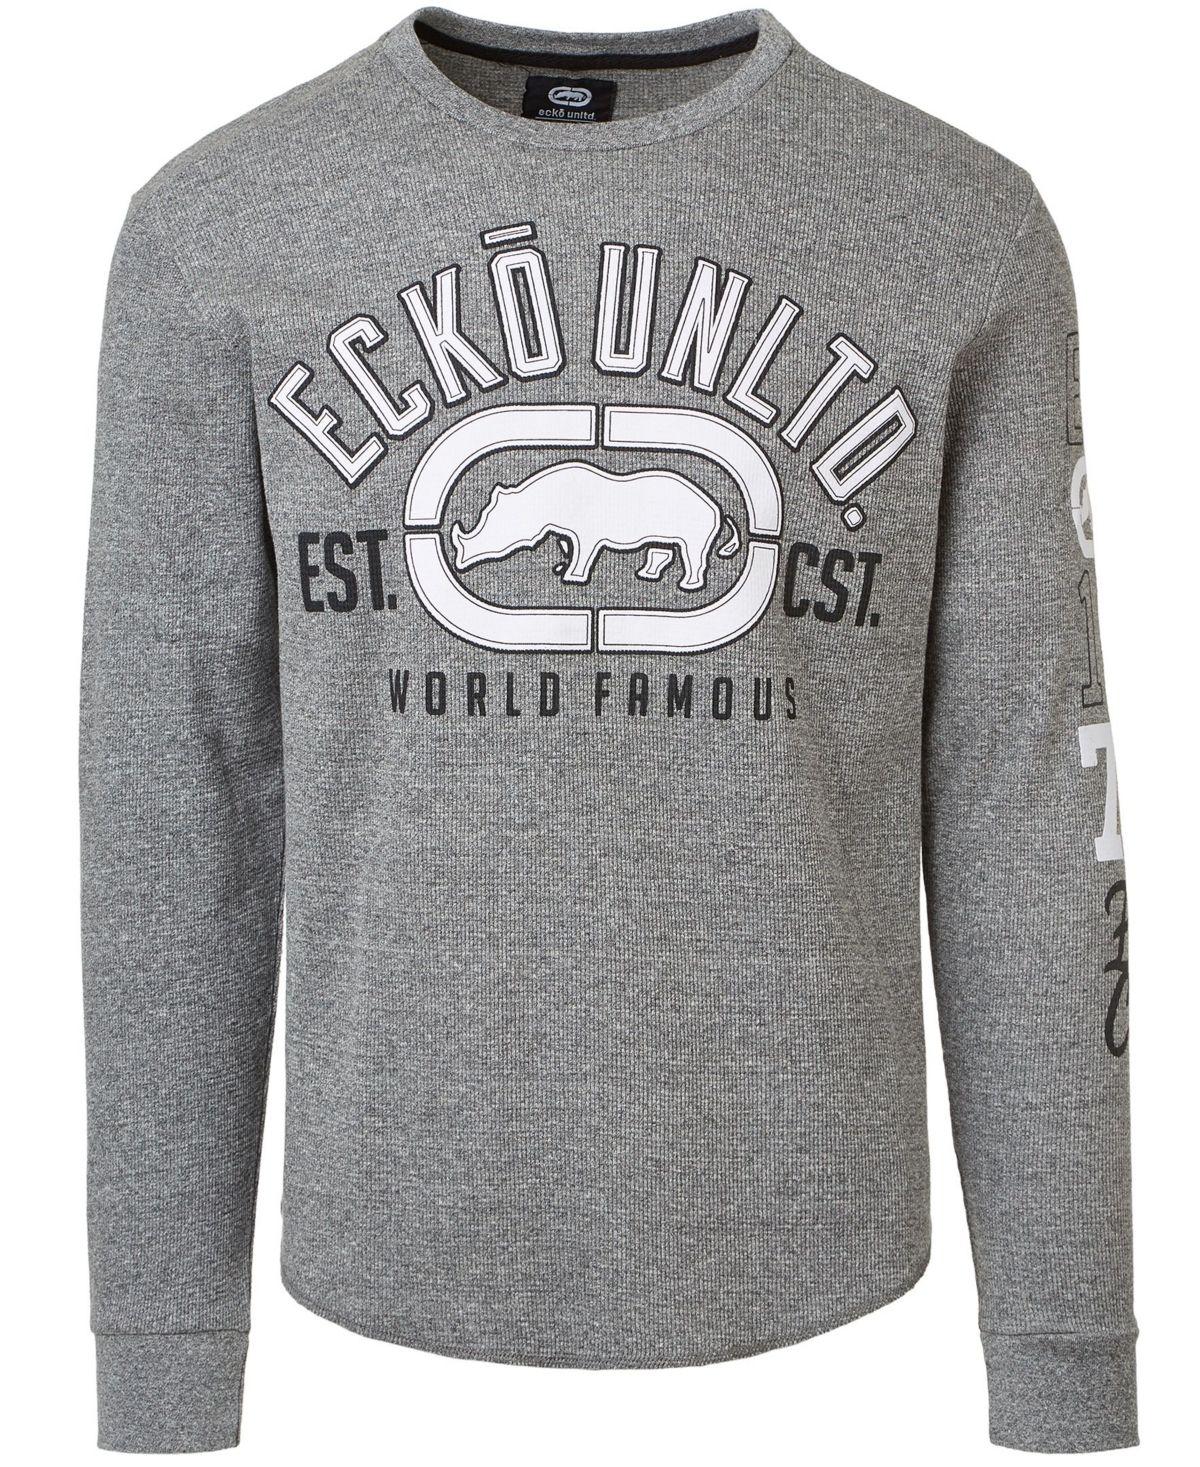 Ecko Unltd Men S Relentless Rhino Thermal Long Sleeve Grey Marle Thermal Long Sleeve Long Sleeve Mens Tshirts [ 1467 x 1200 Pixel ]